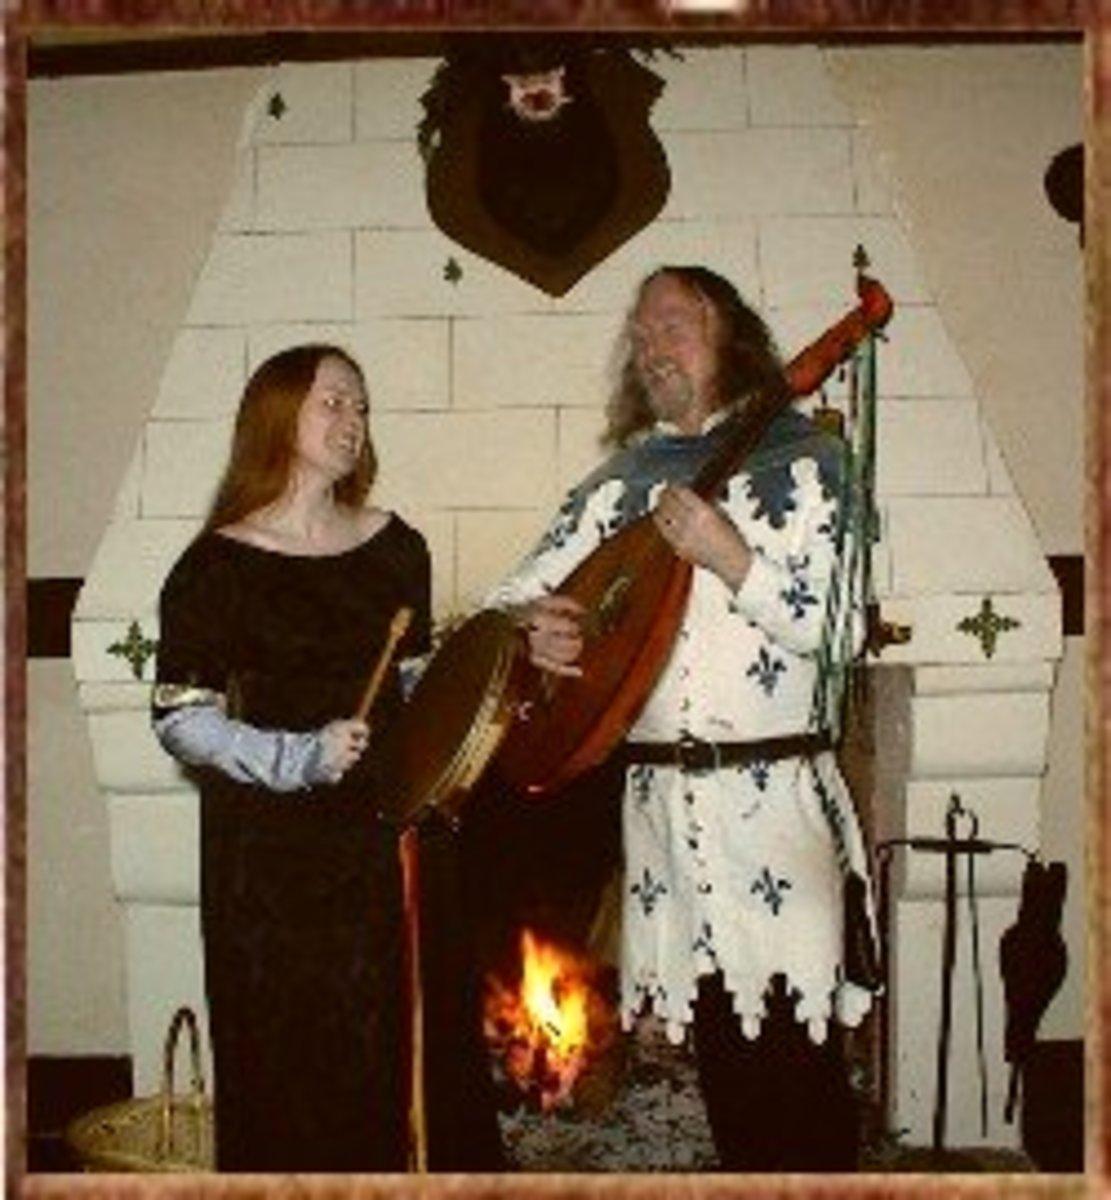 Musicians in medieval attire.